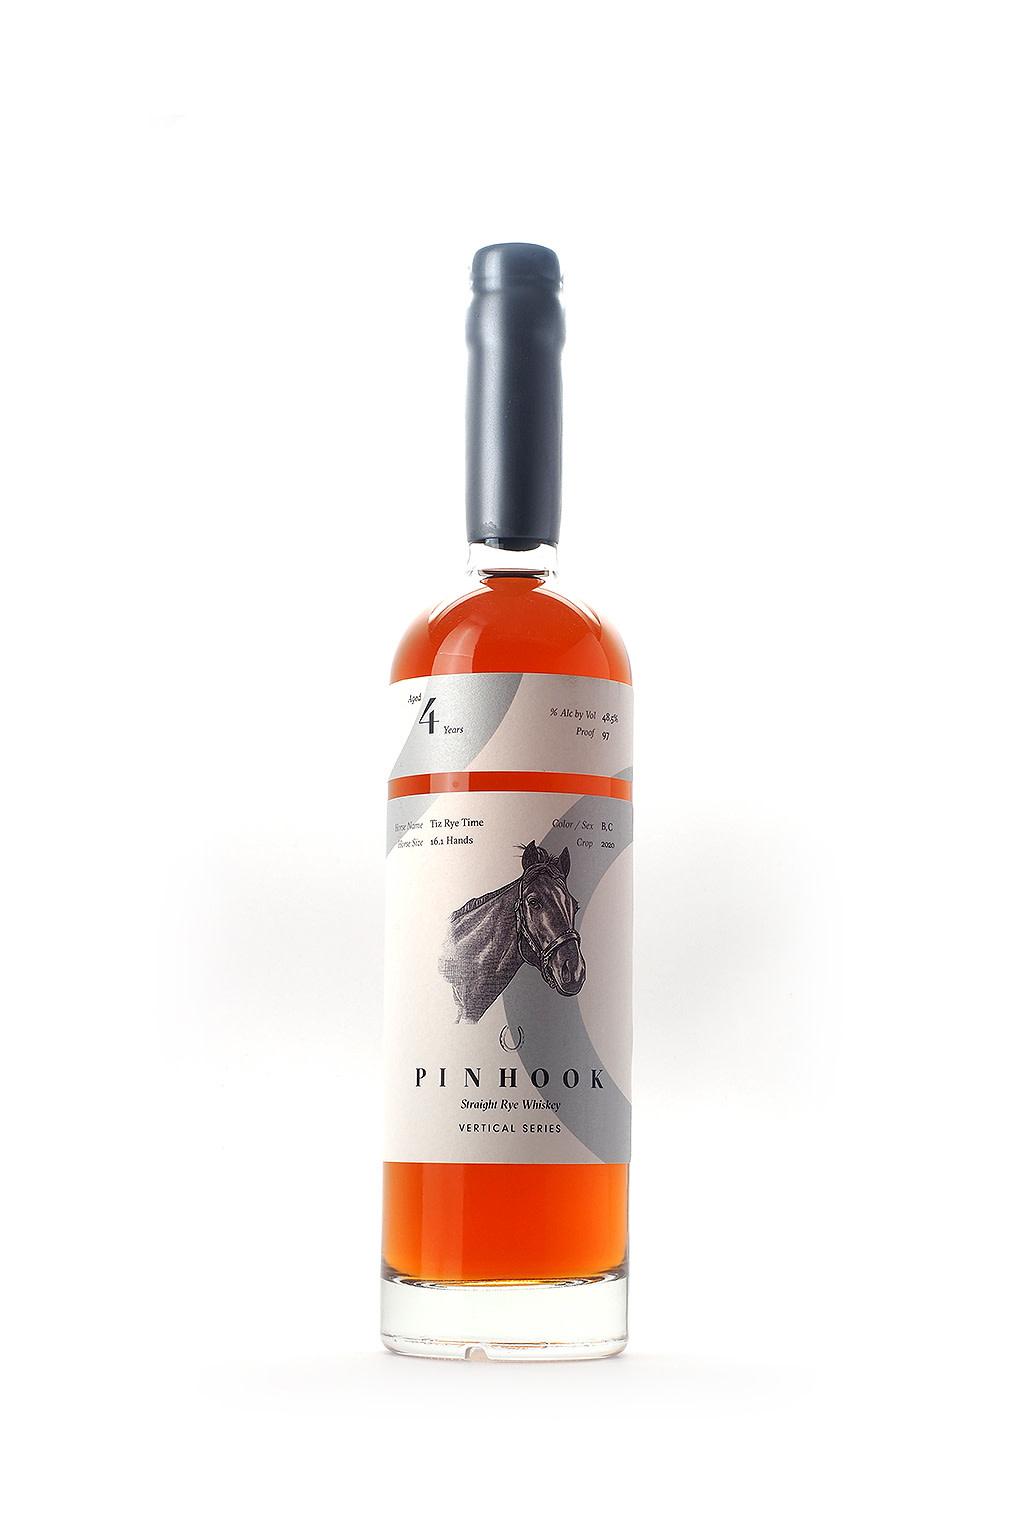 Pinhook Vertical Series Tiz Rye Time 4 Year Straight Rye Whiskey